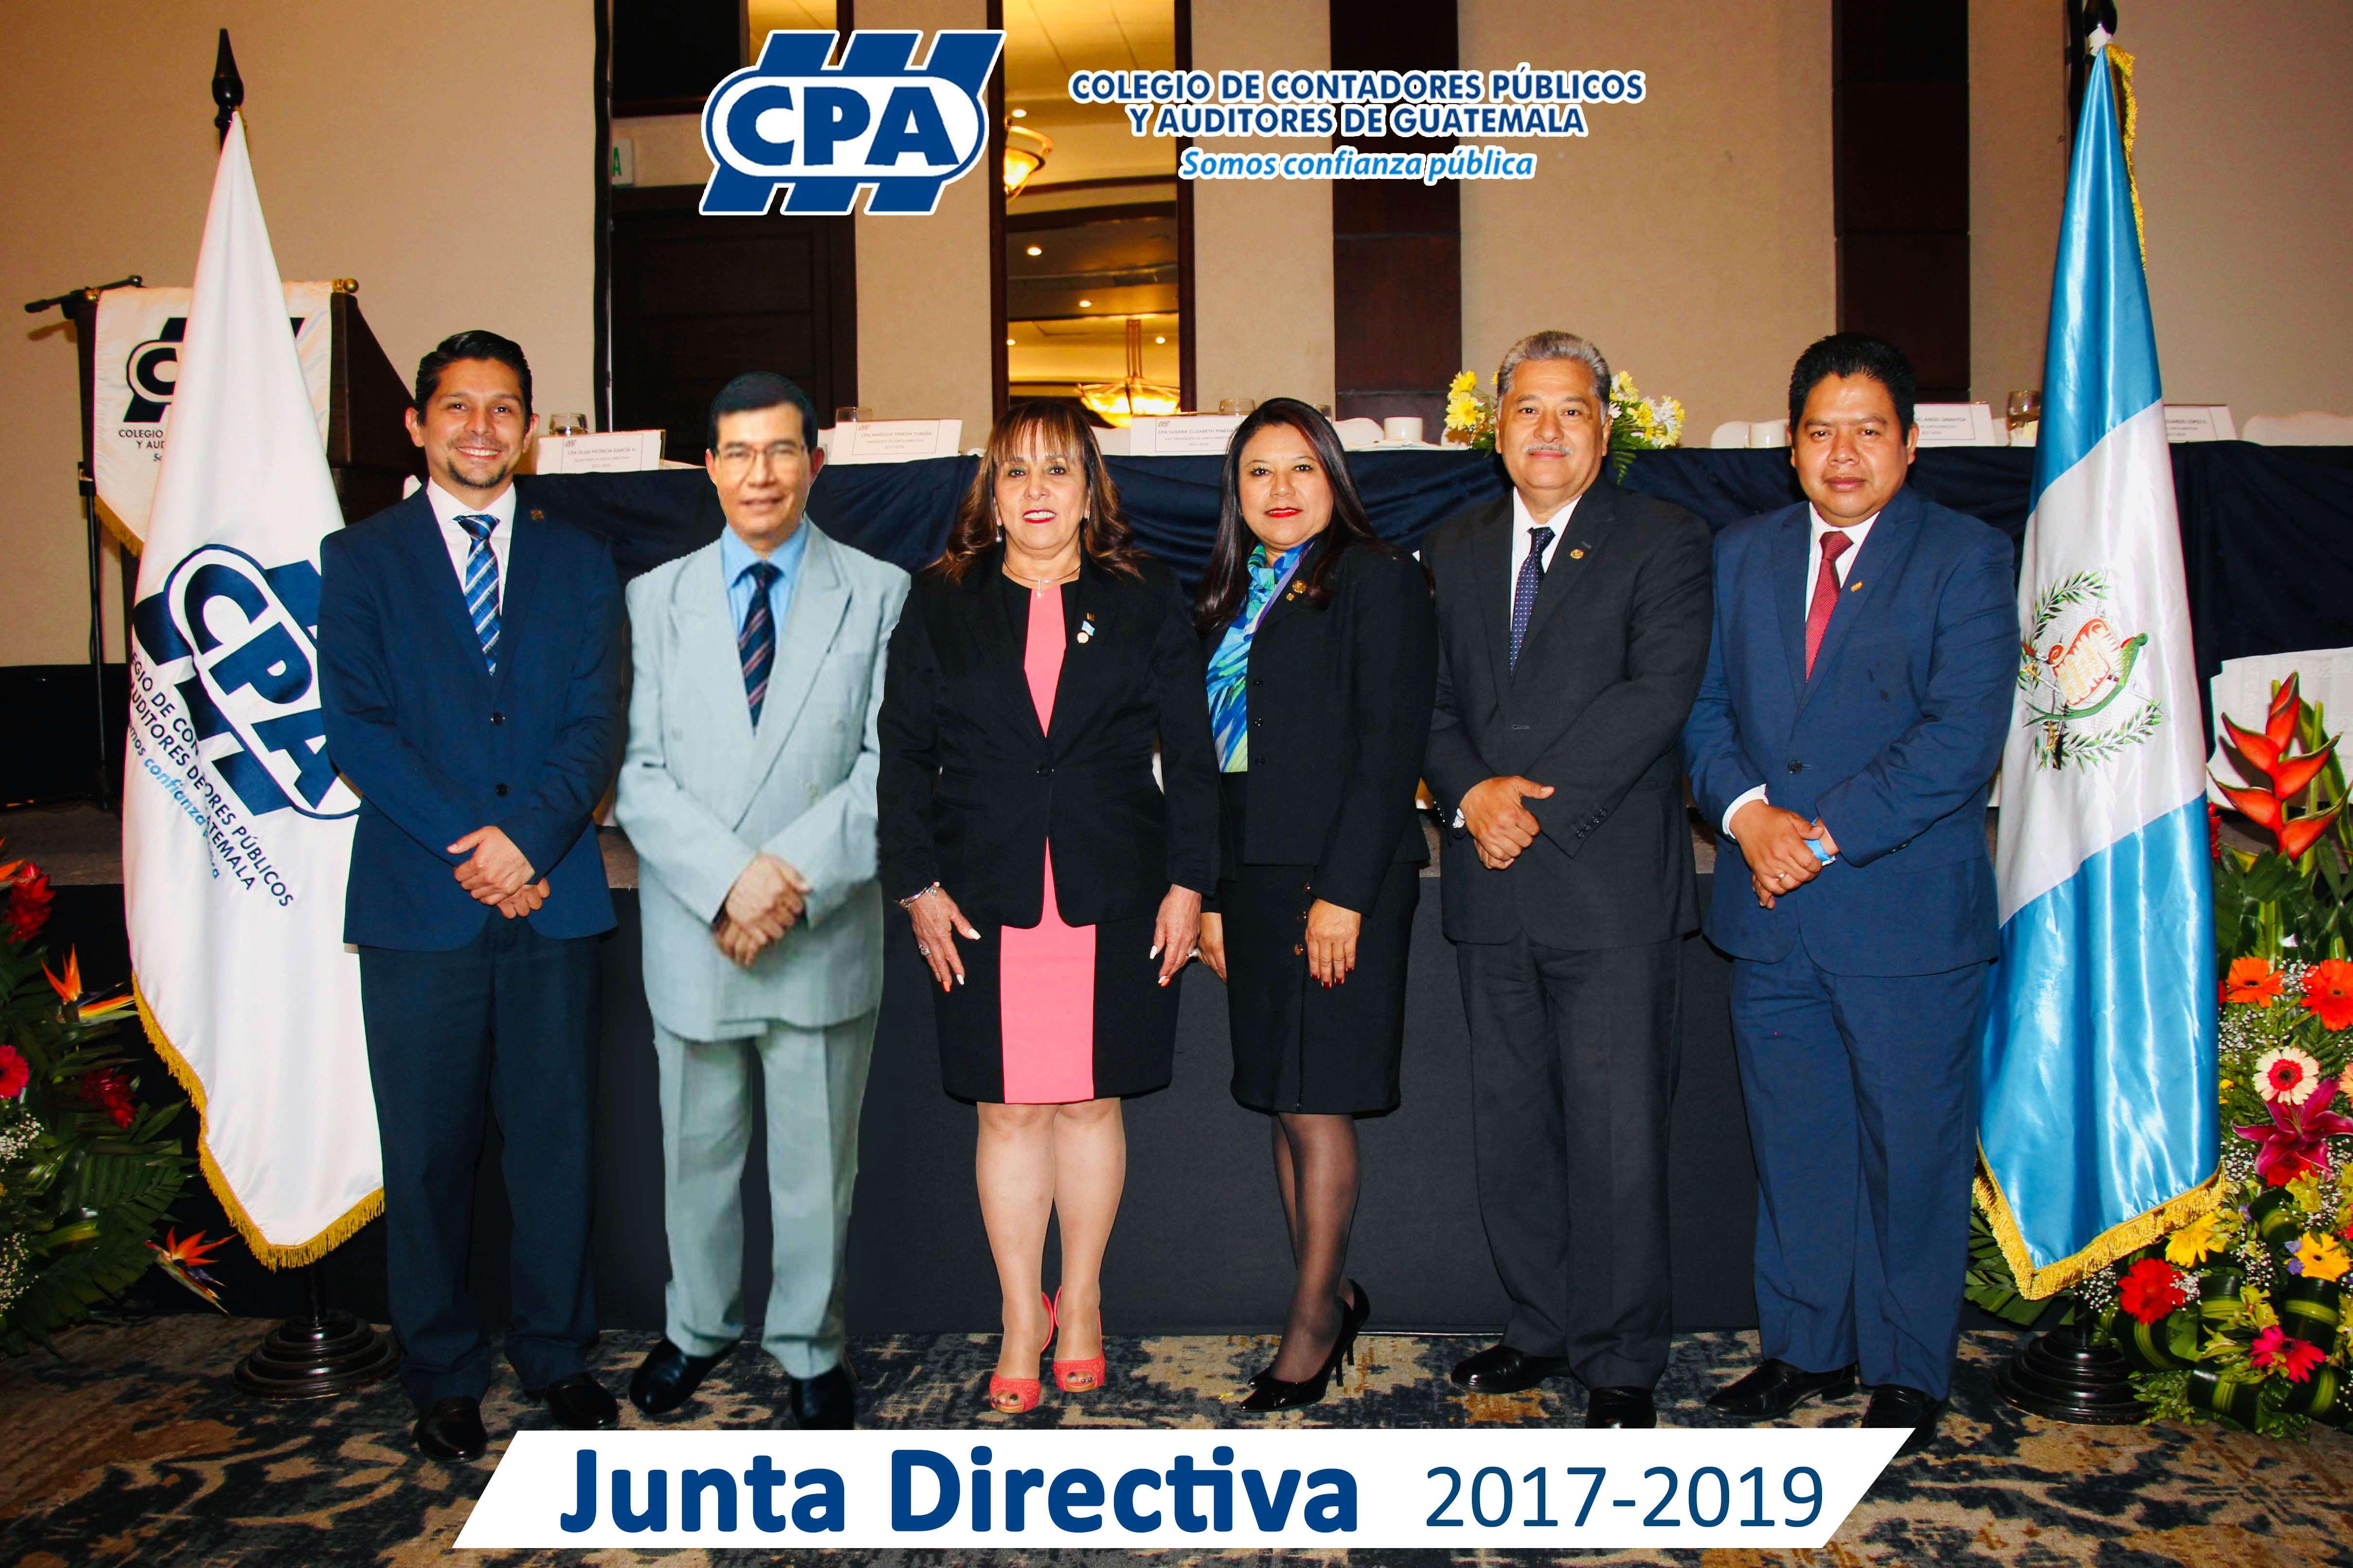 Junta Directiva - 2017-2019